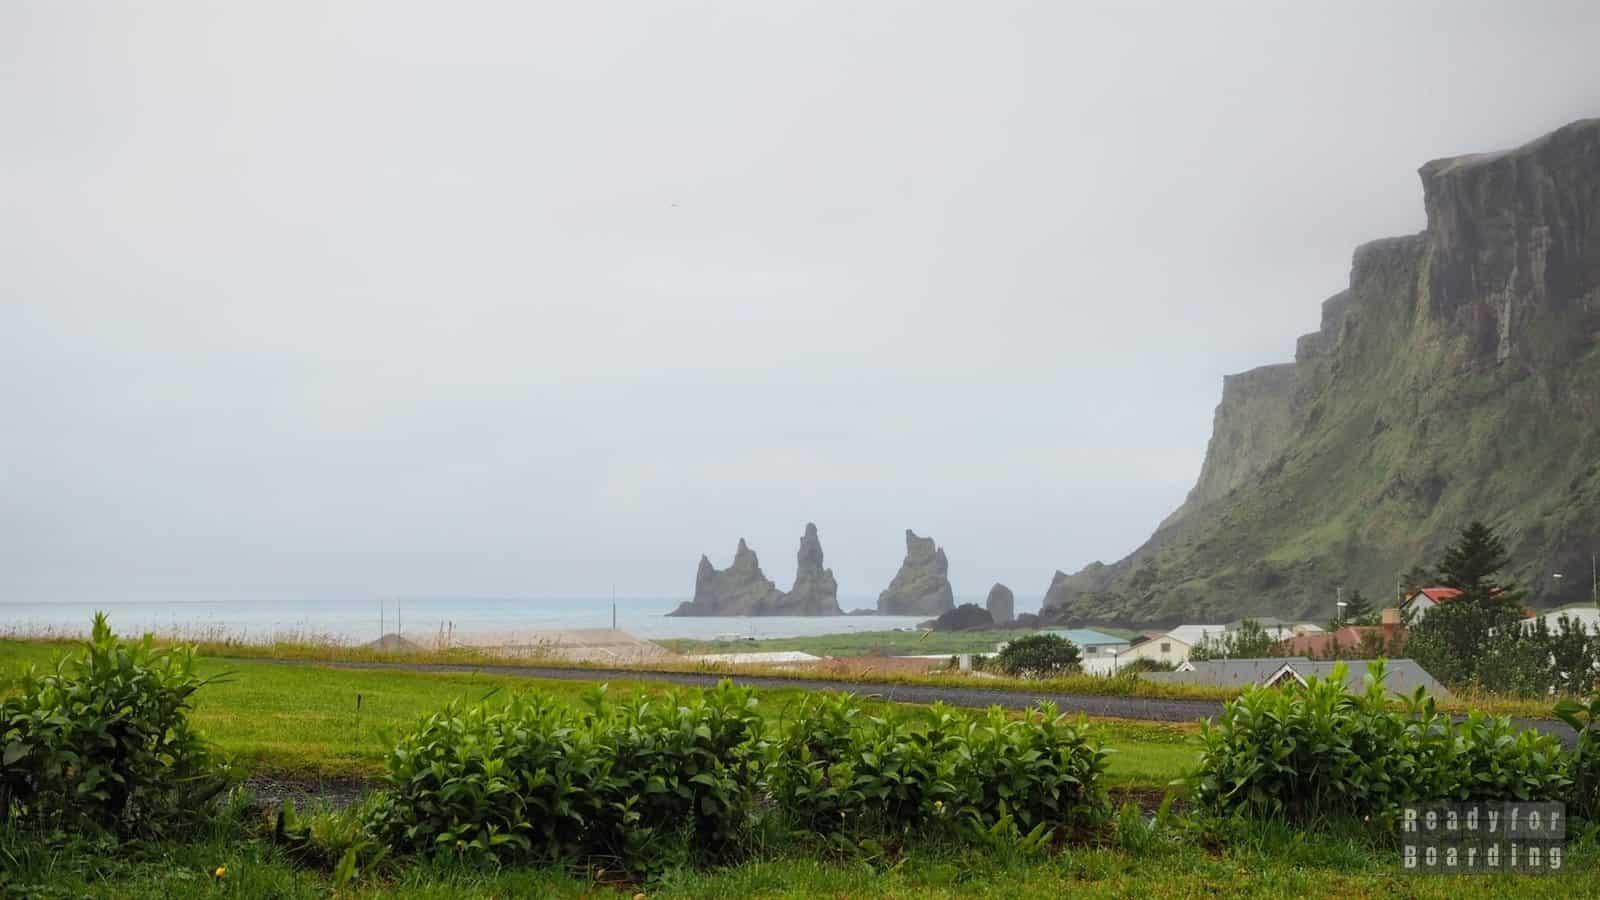 Islandia - droga do Vik (galeria zdjęć)